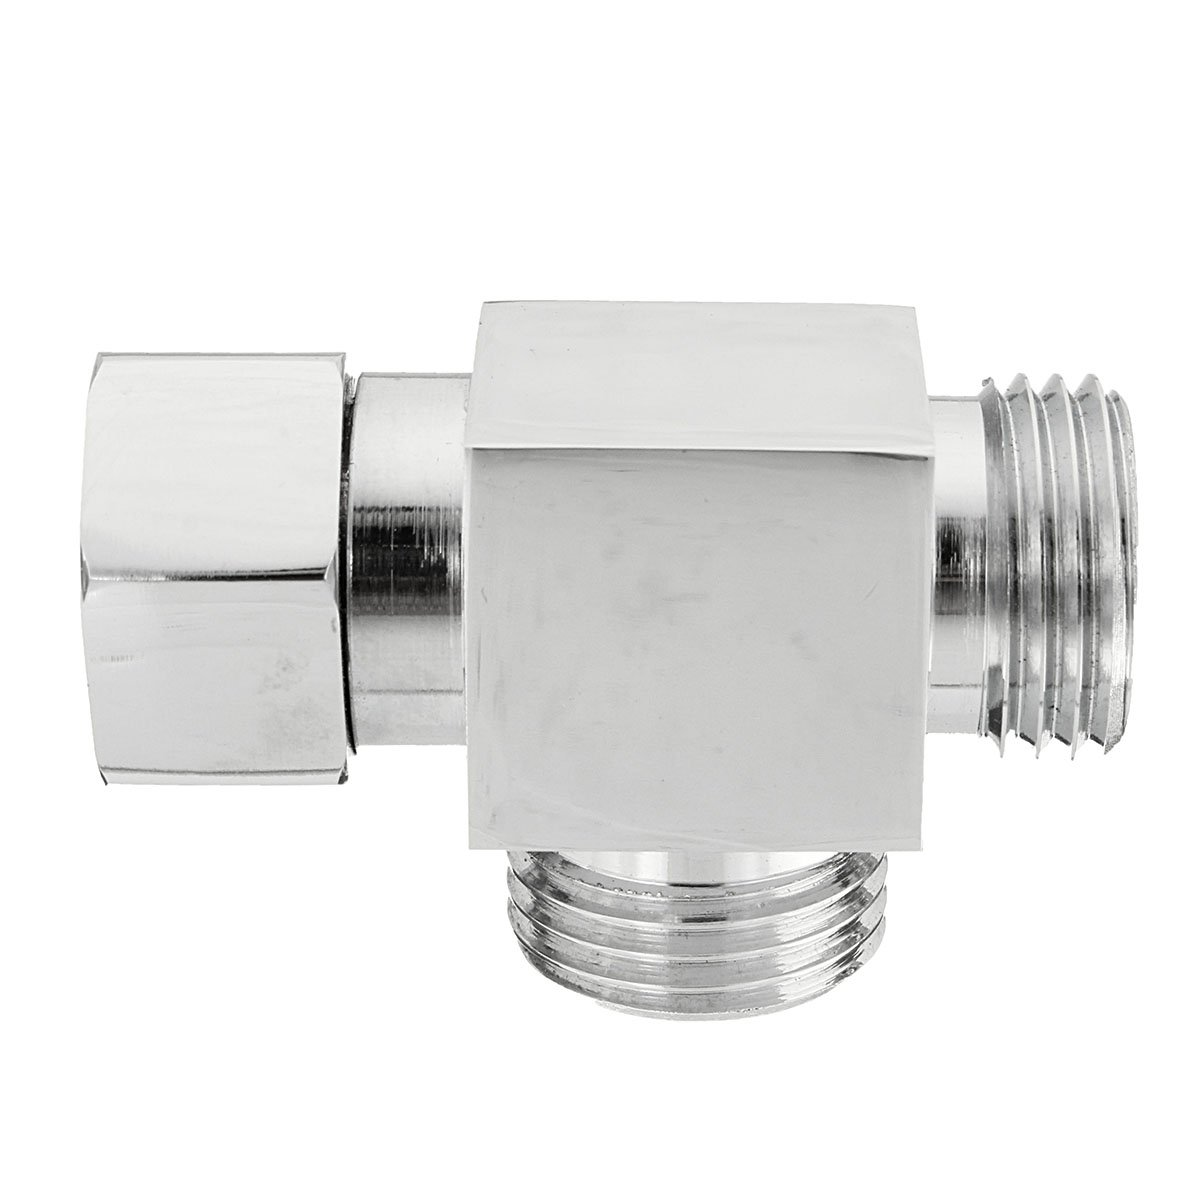 SEVENMORE G1//2 Brass 3 Way T-Adapter Angle Valve Diverter Shower Head Water Separator Valve Convertor